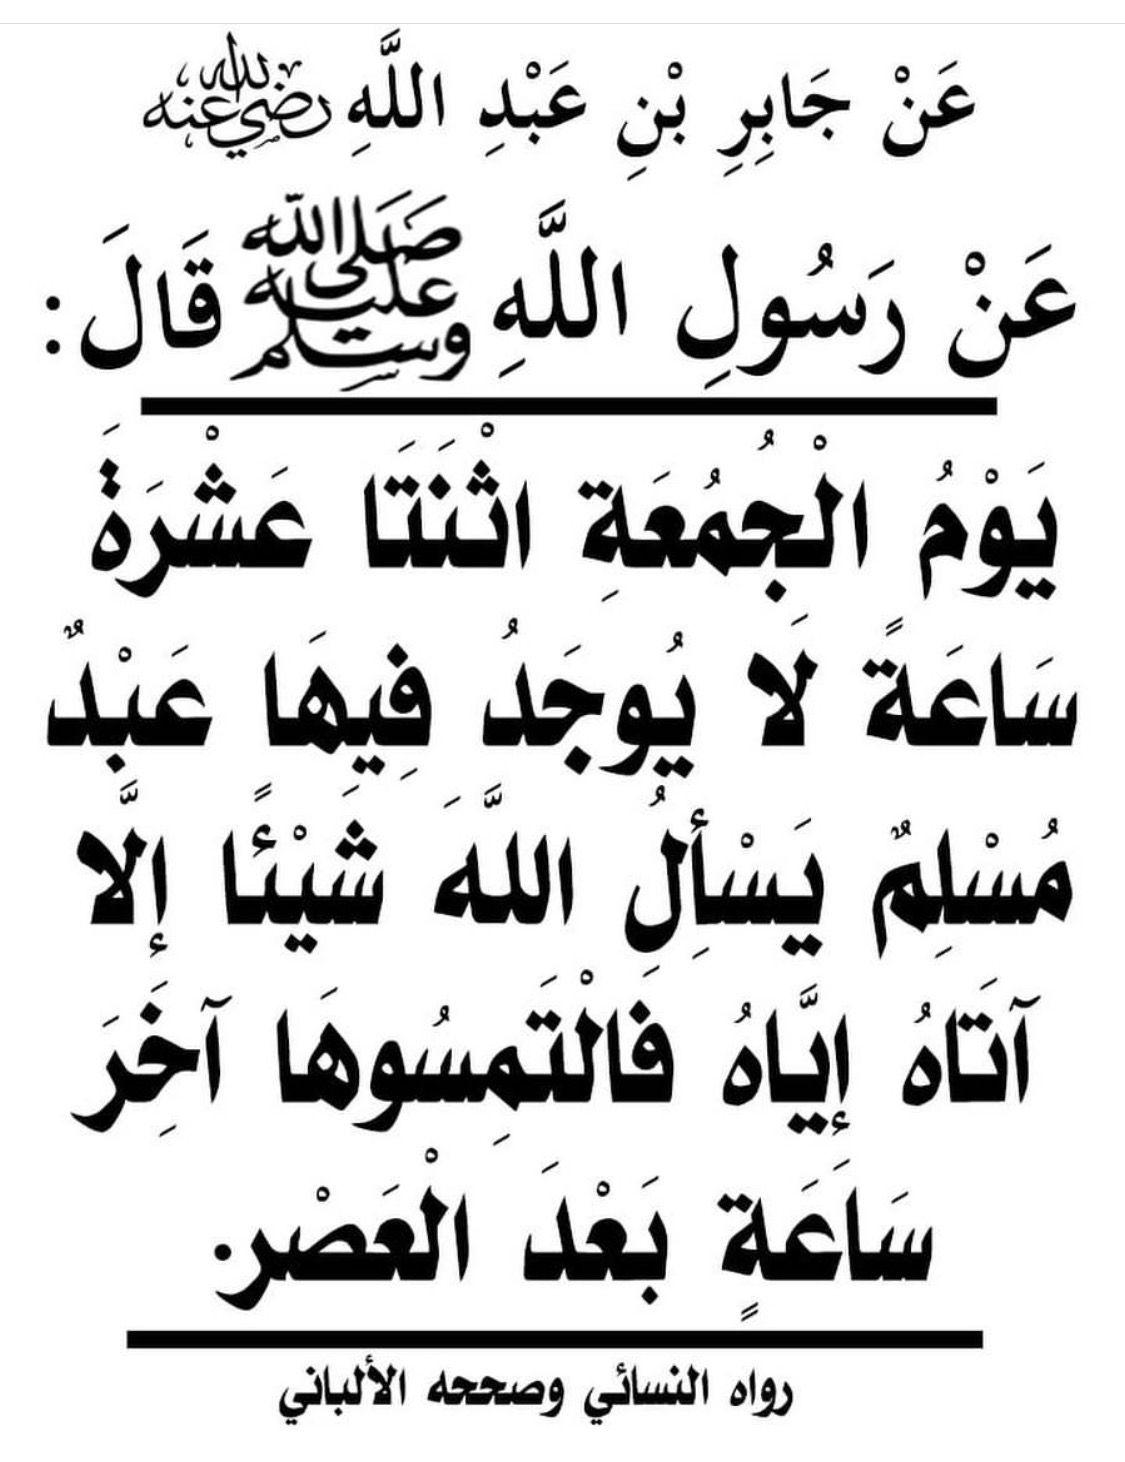 Pin By Ghela 1986 On أحاديث نبوية Ahadith Allah Quotes Islam